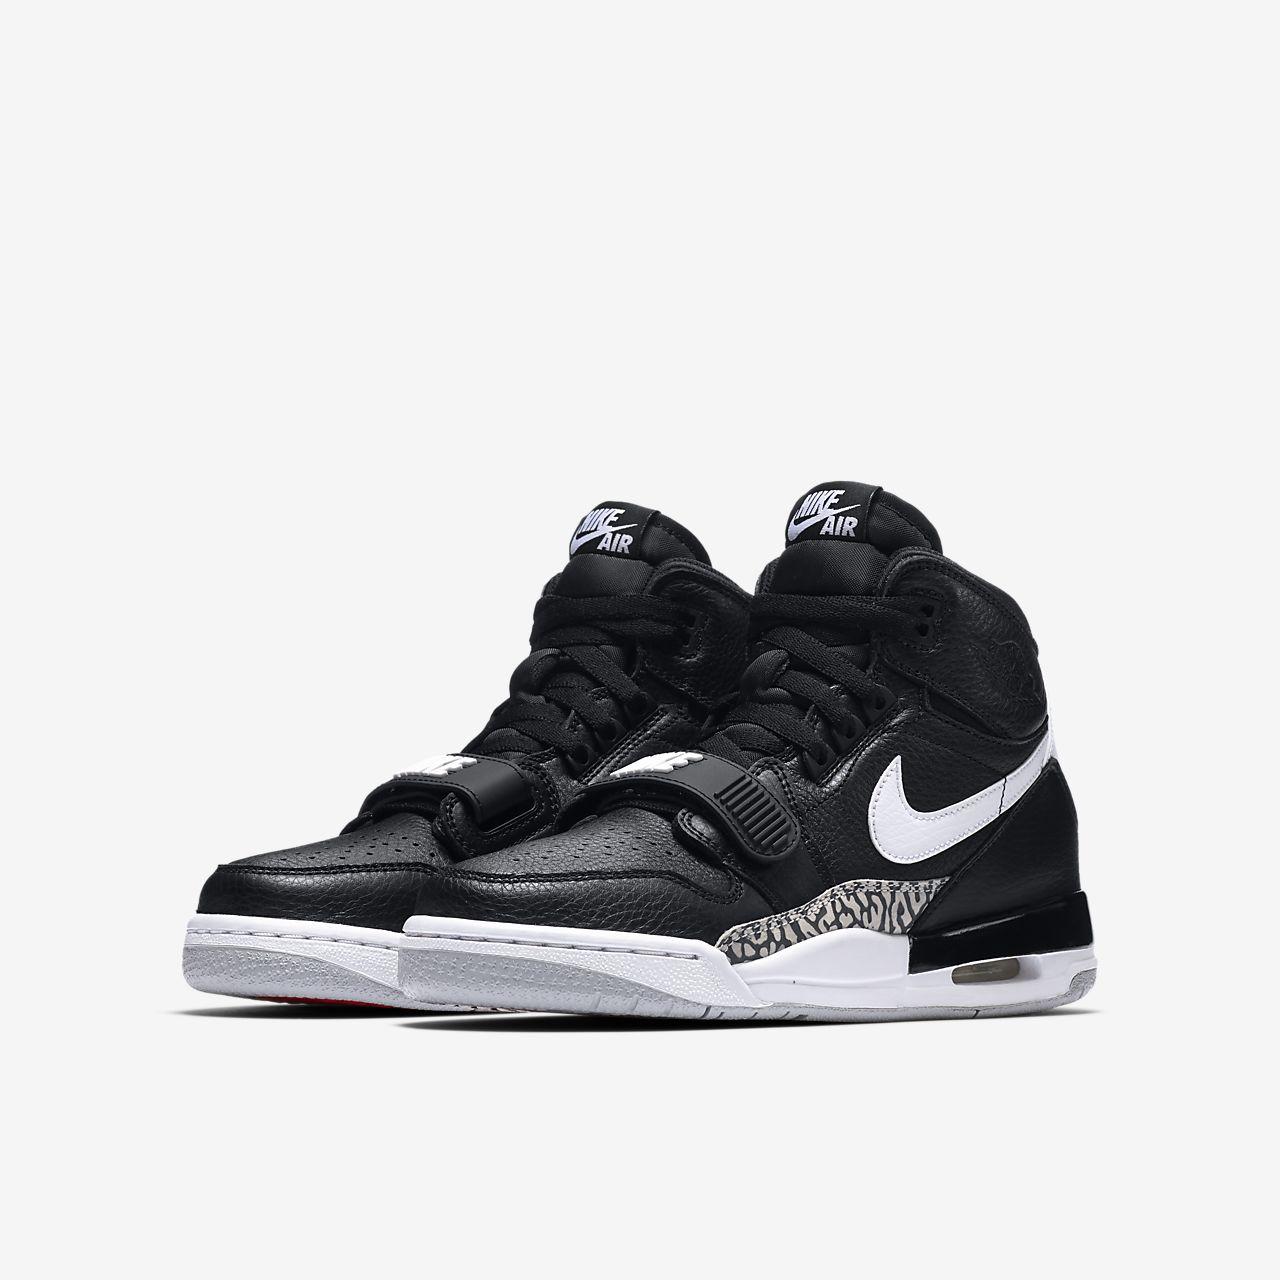 b206d60662ed1 Air Jordan Legacy 312 Older Kids  Shoe. Nike.com IE